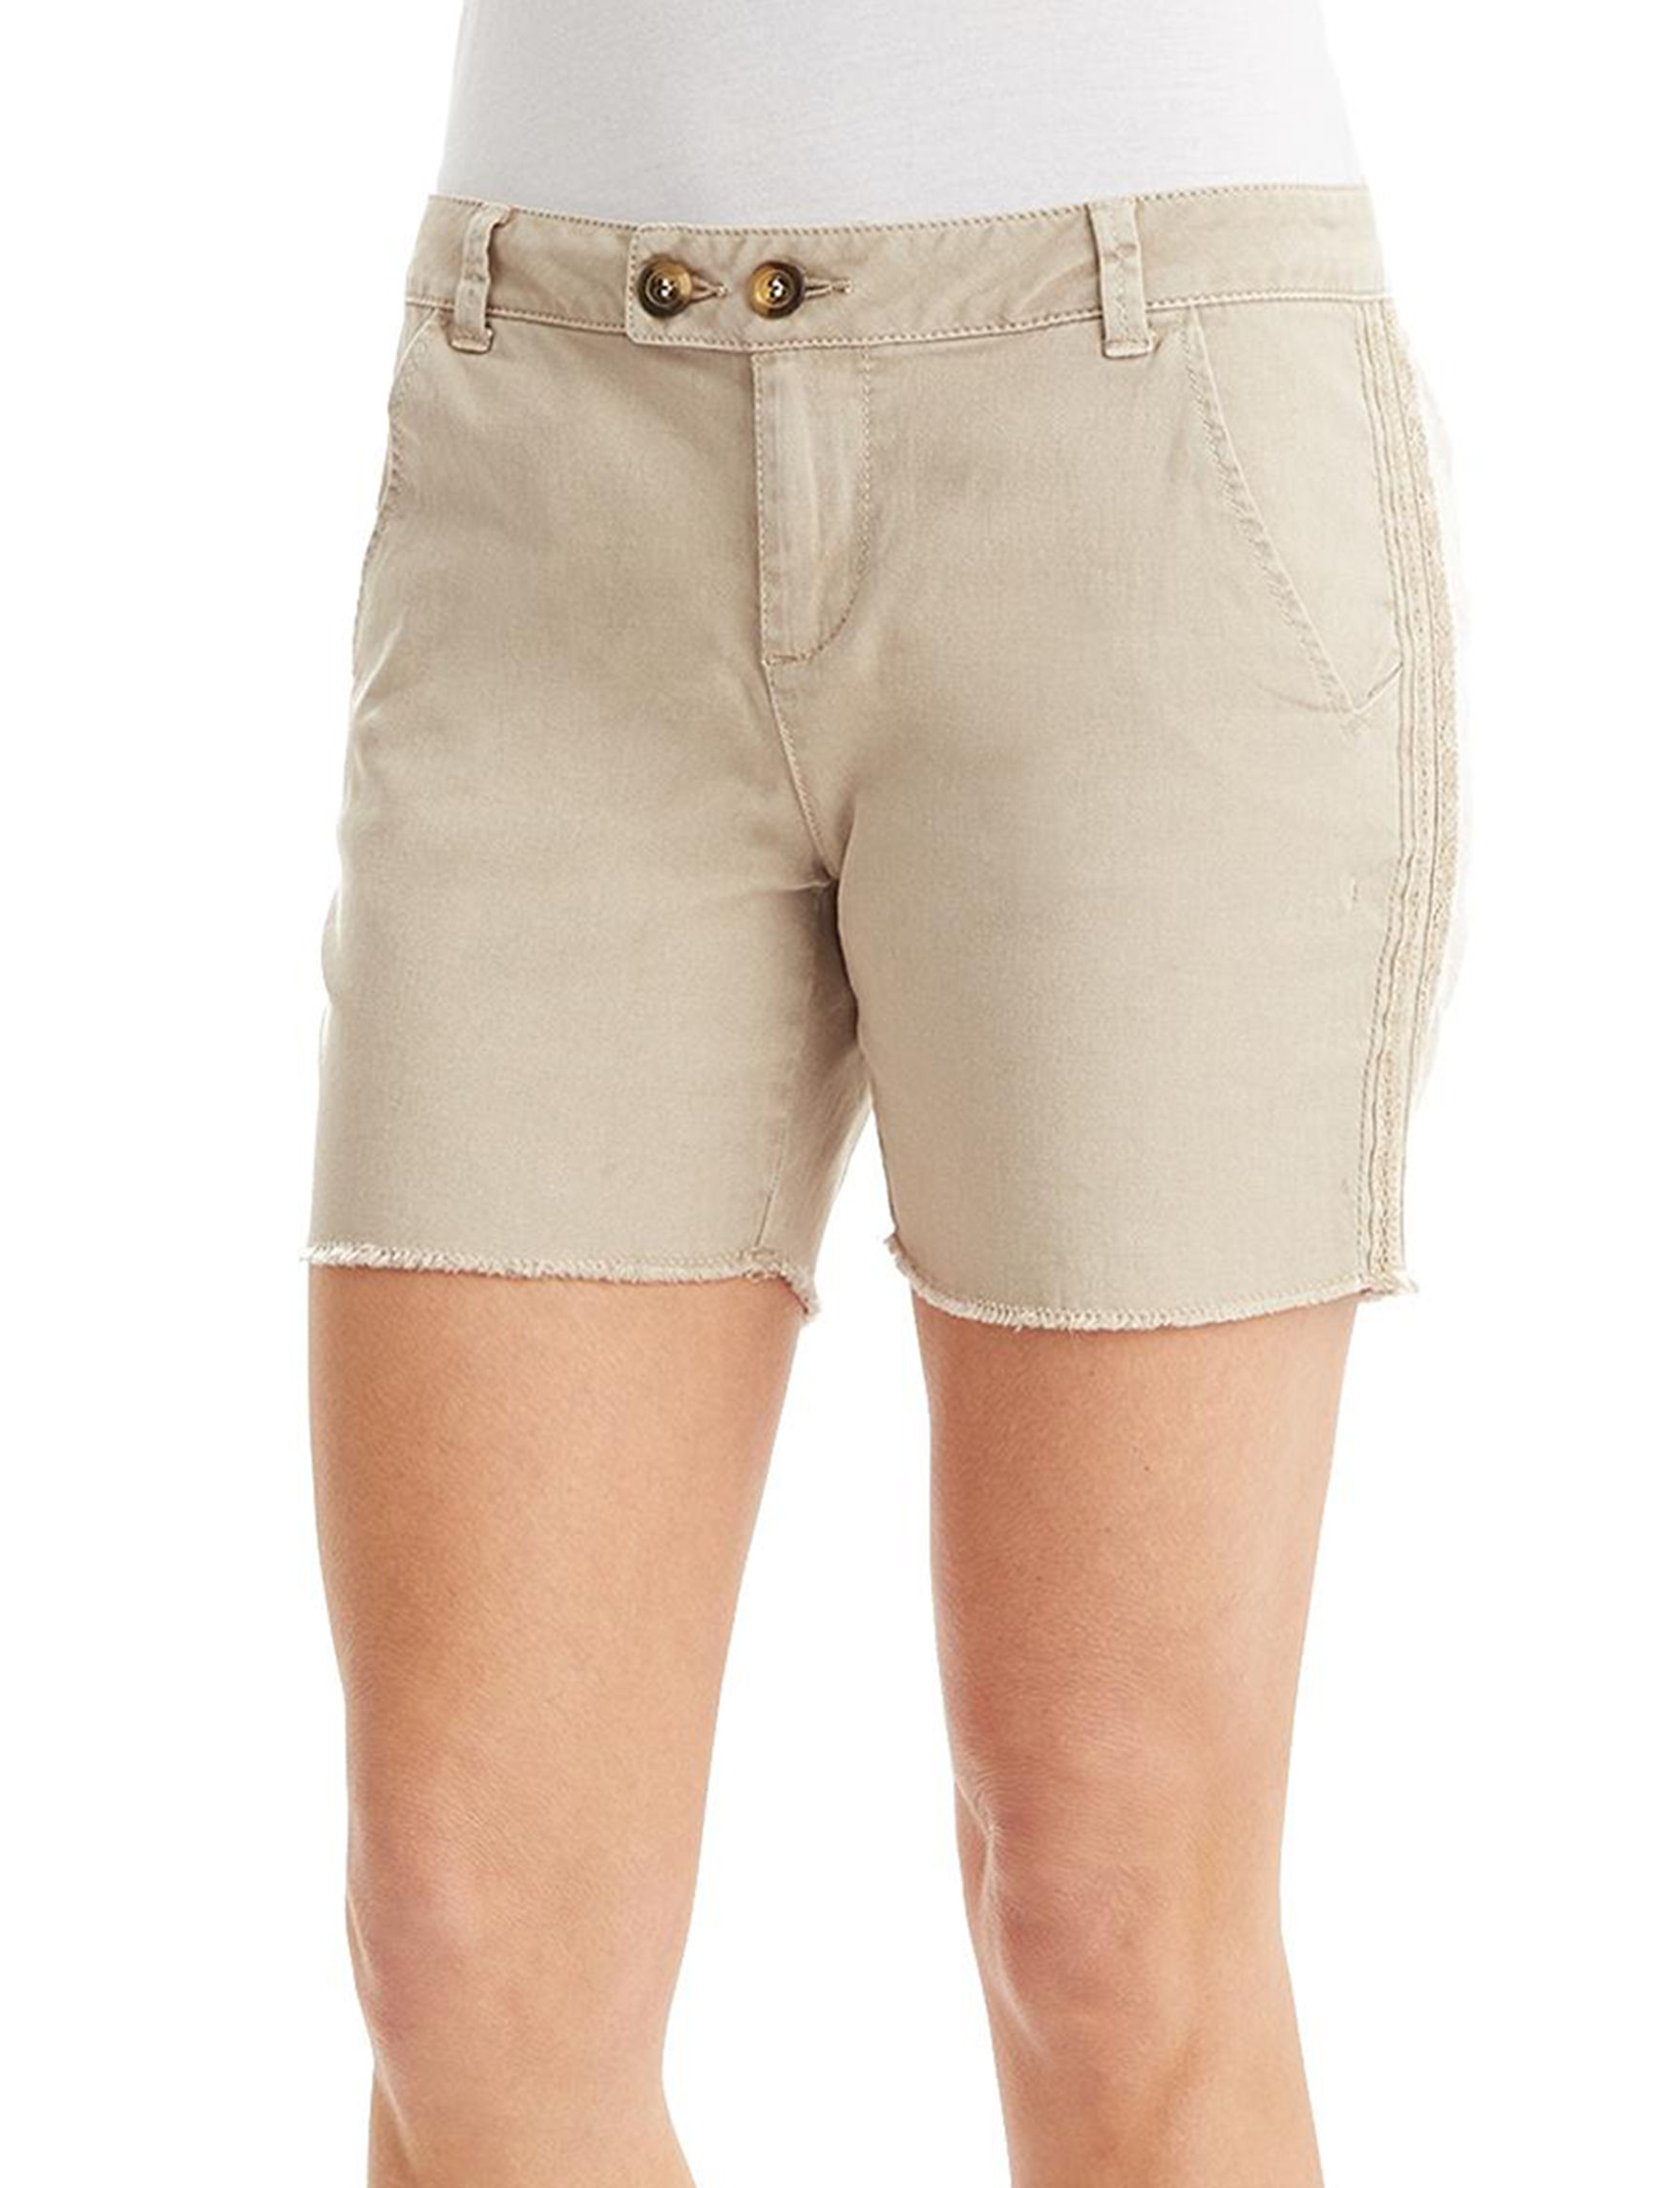 Democracy Pebble Tailored Shorts